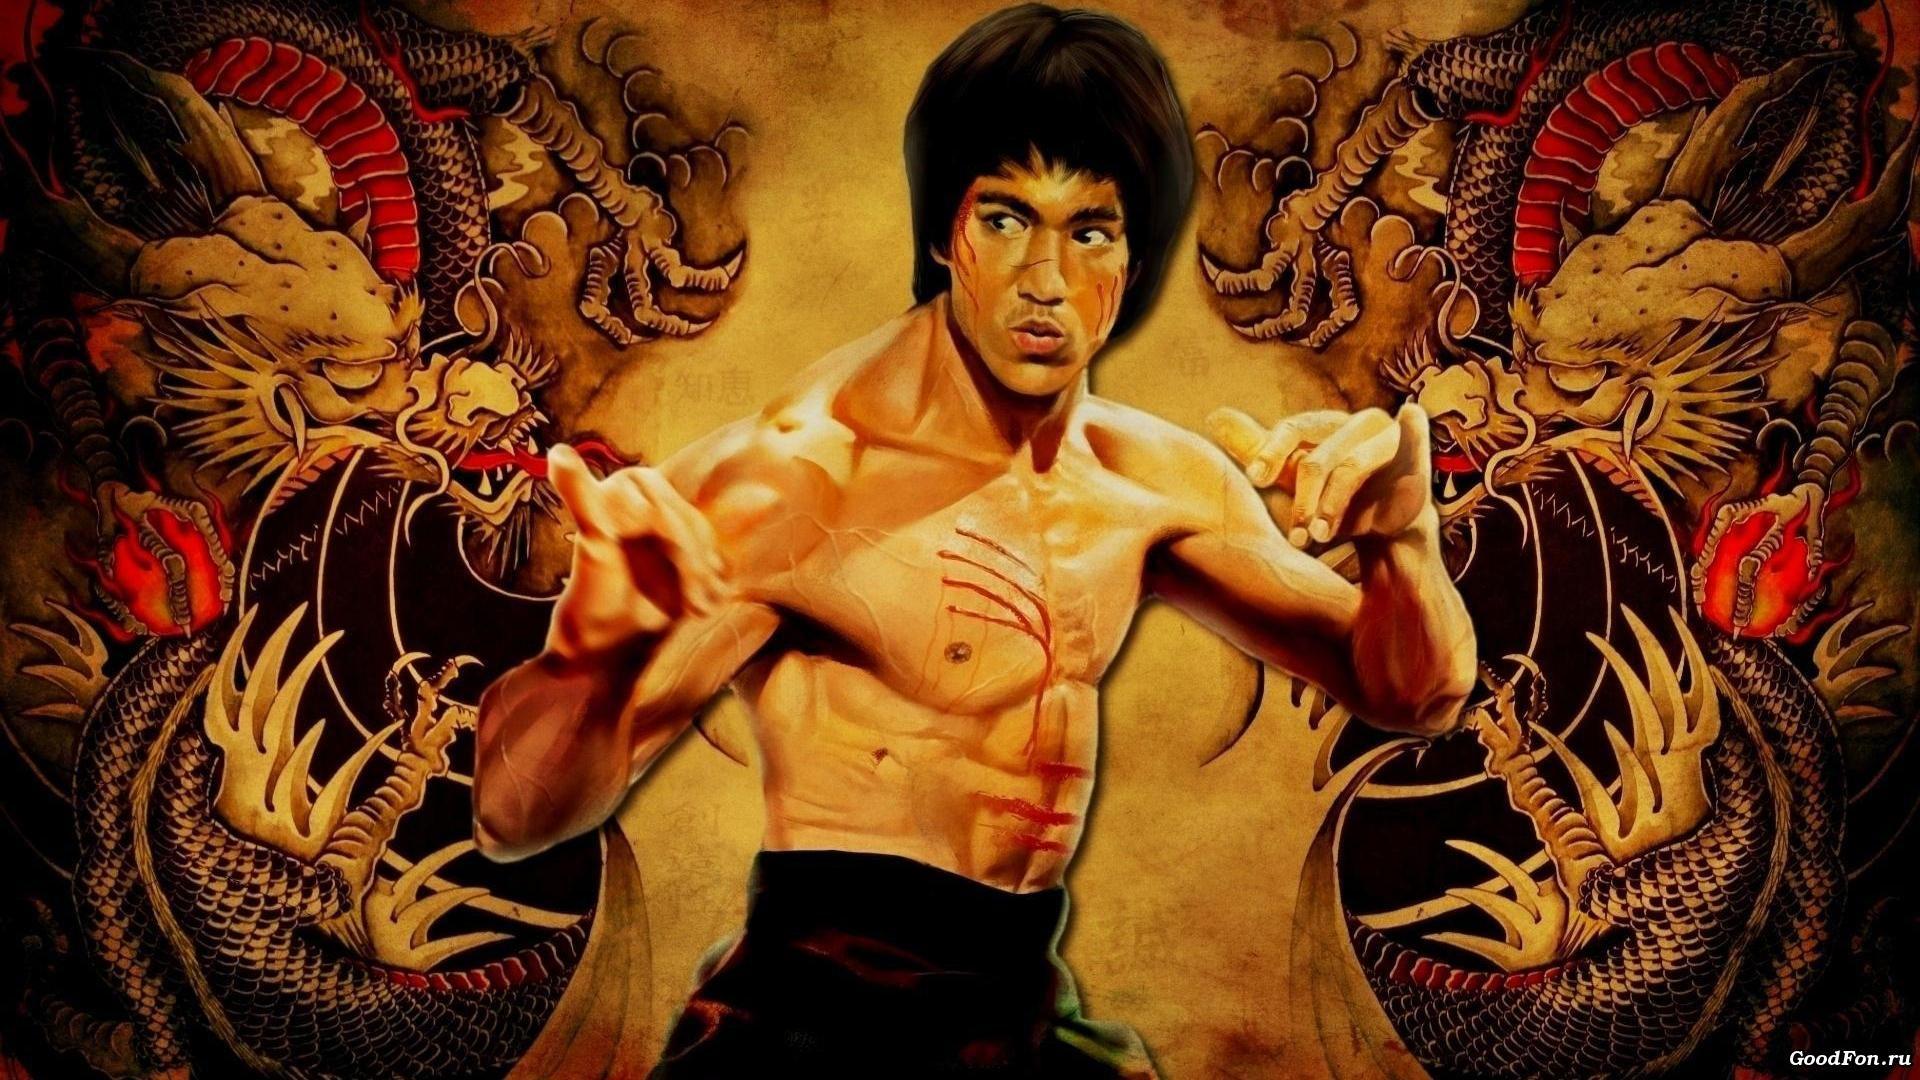 Bruce Lee HD Iphone Wallpaper ~ HD Iphone Wallpaper 640×960 Wallpapers Of Bruce  Lee (47 Wallpapers) | Adorable Wallpapers